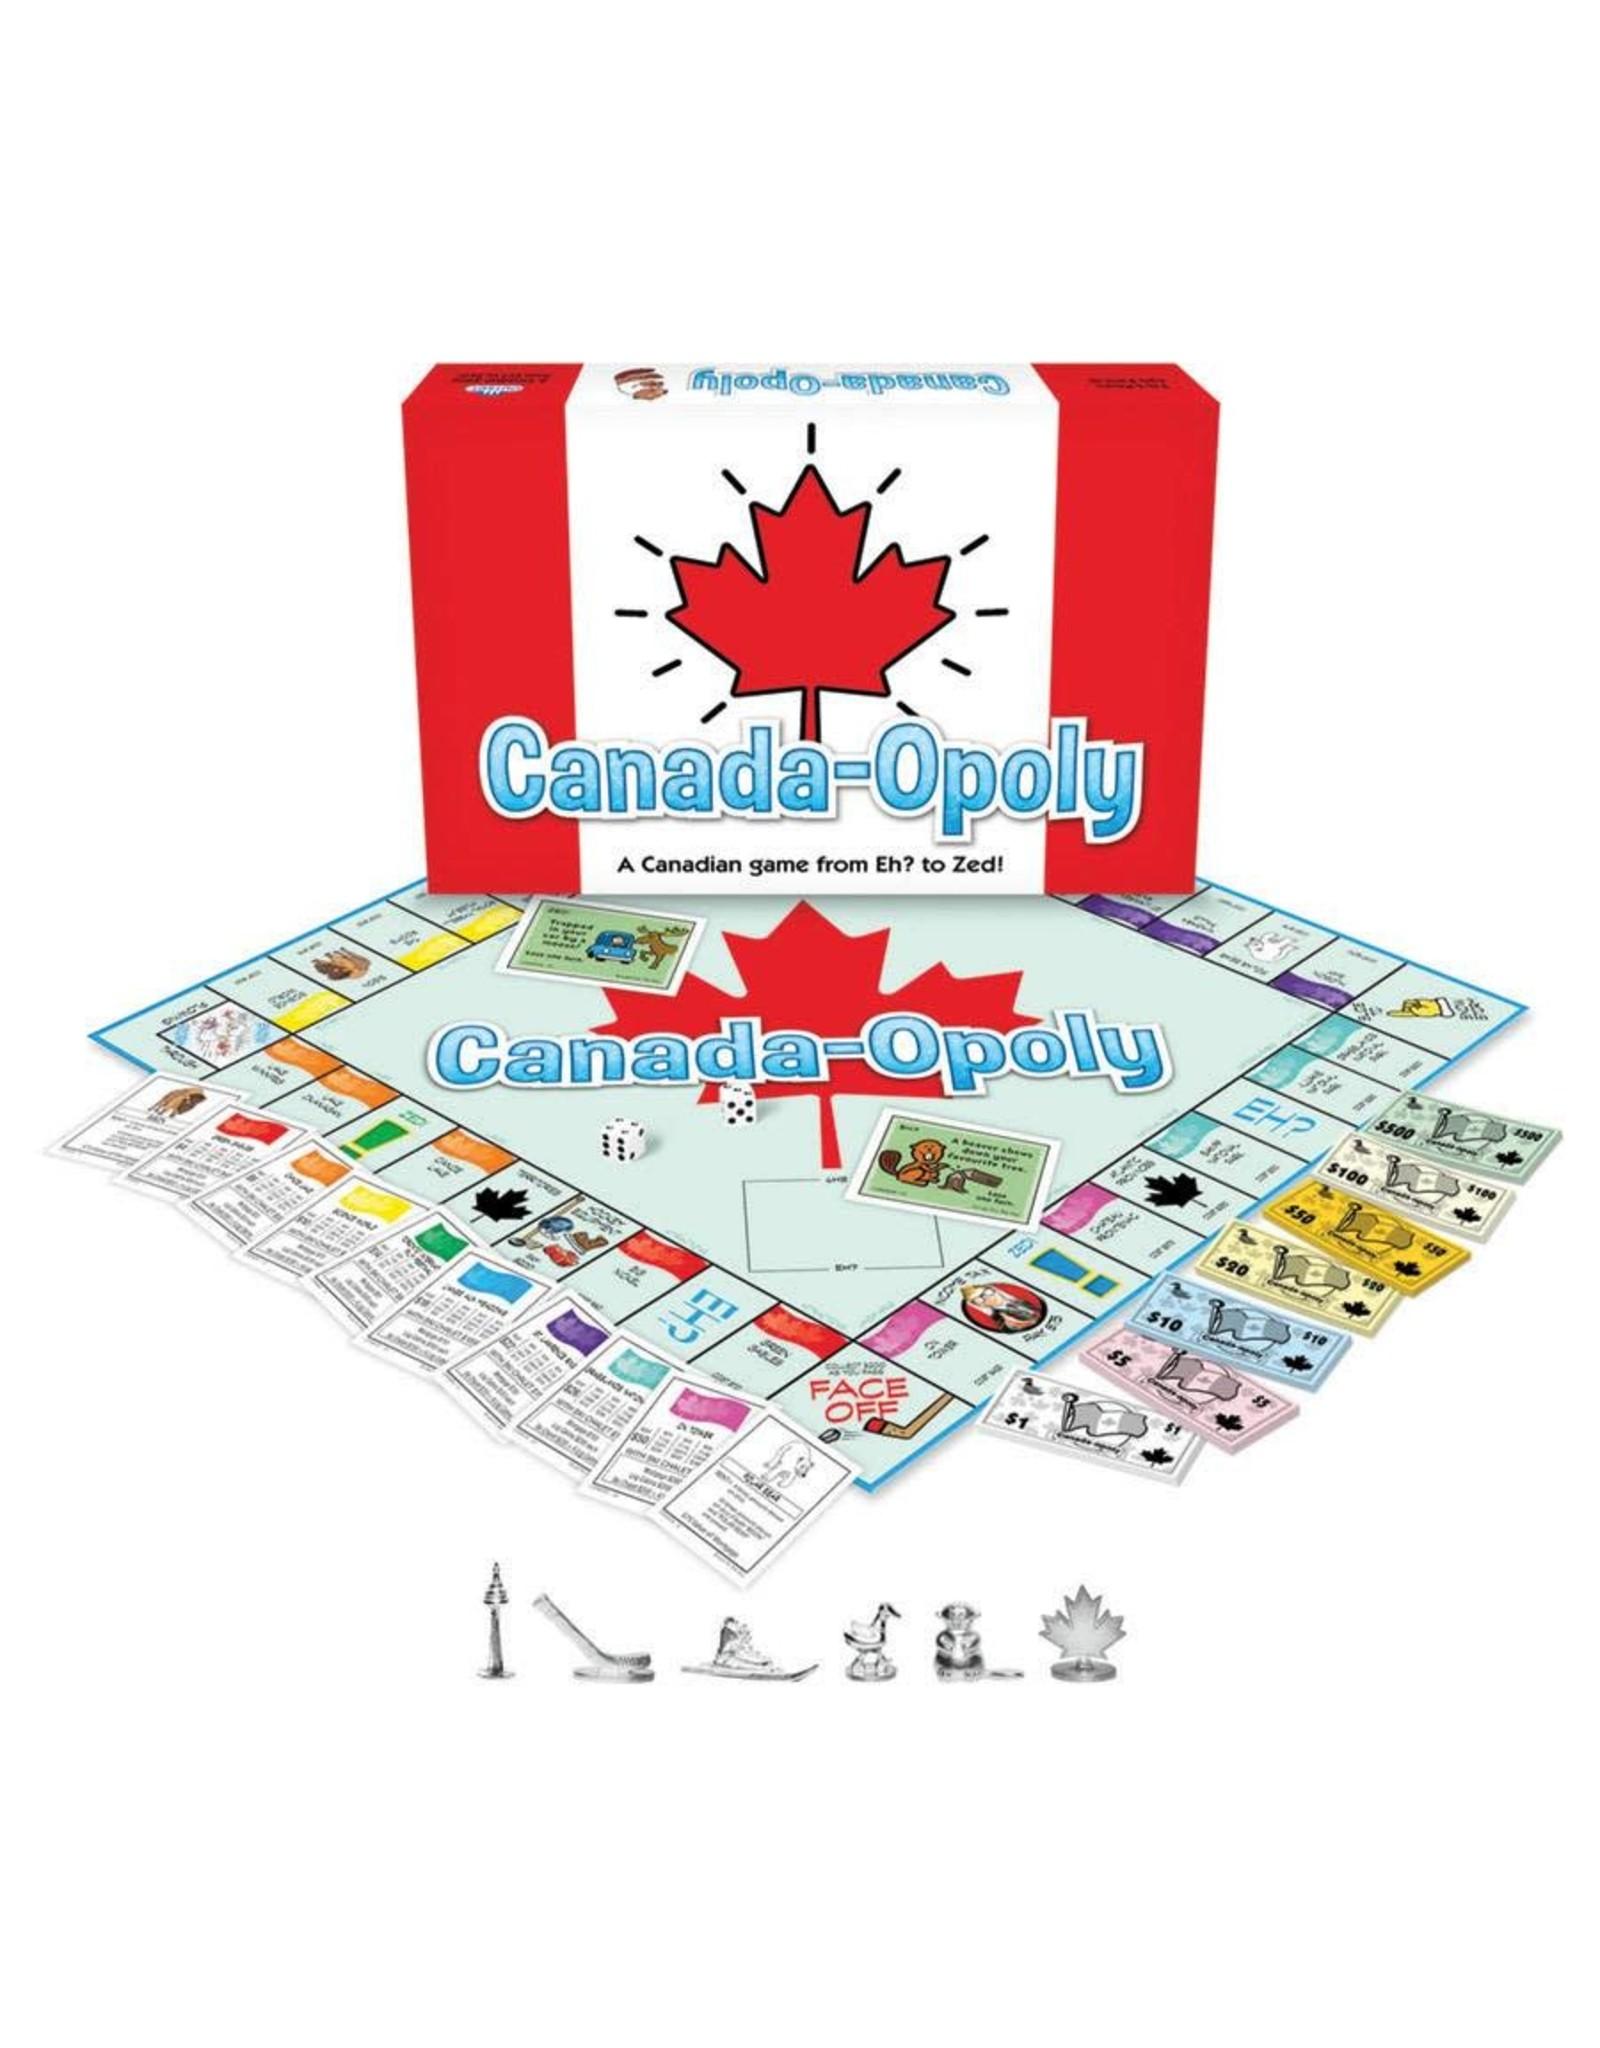 Canada-opoly